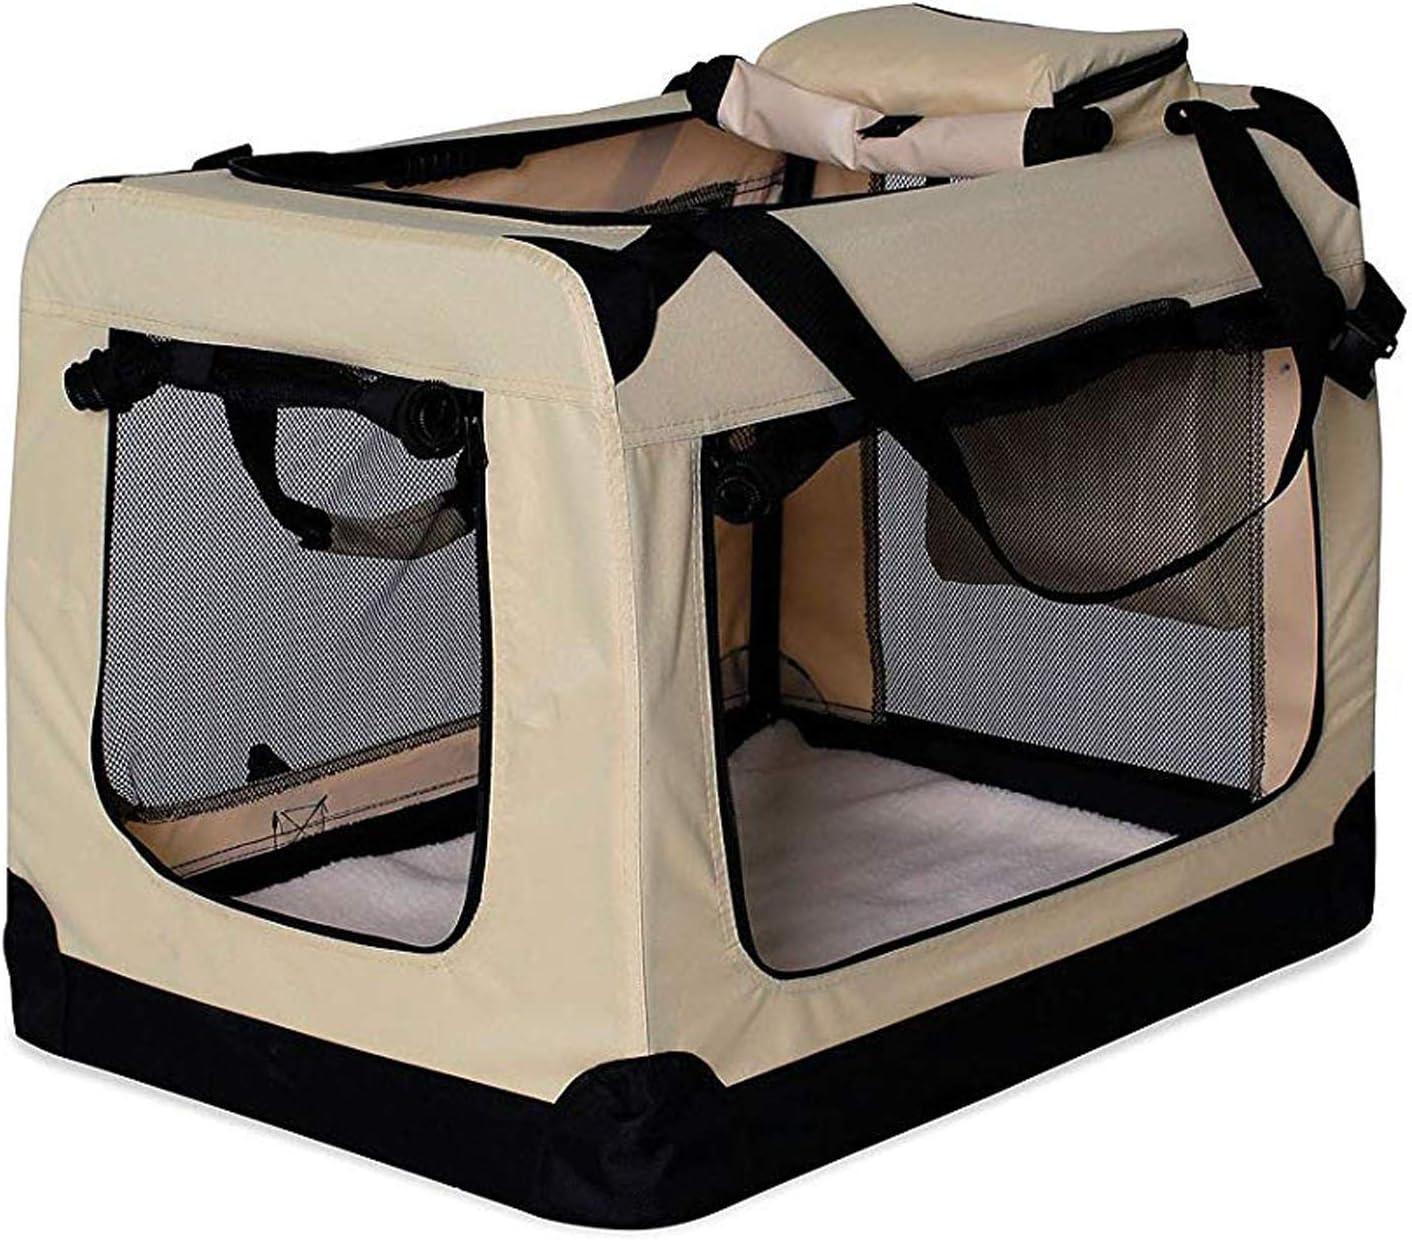 dibea TB10042 Bolsa de Transporte para Perros y Gatos, Beige, (L) 70x52x50 cm